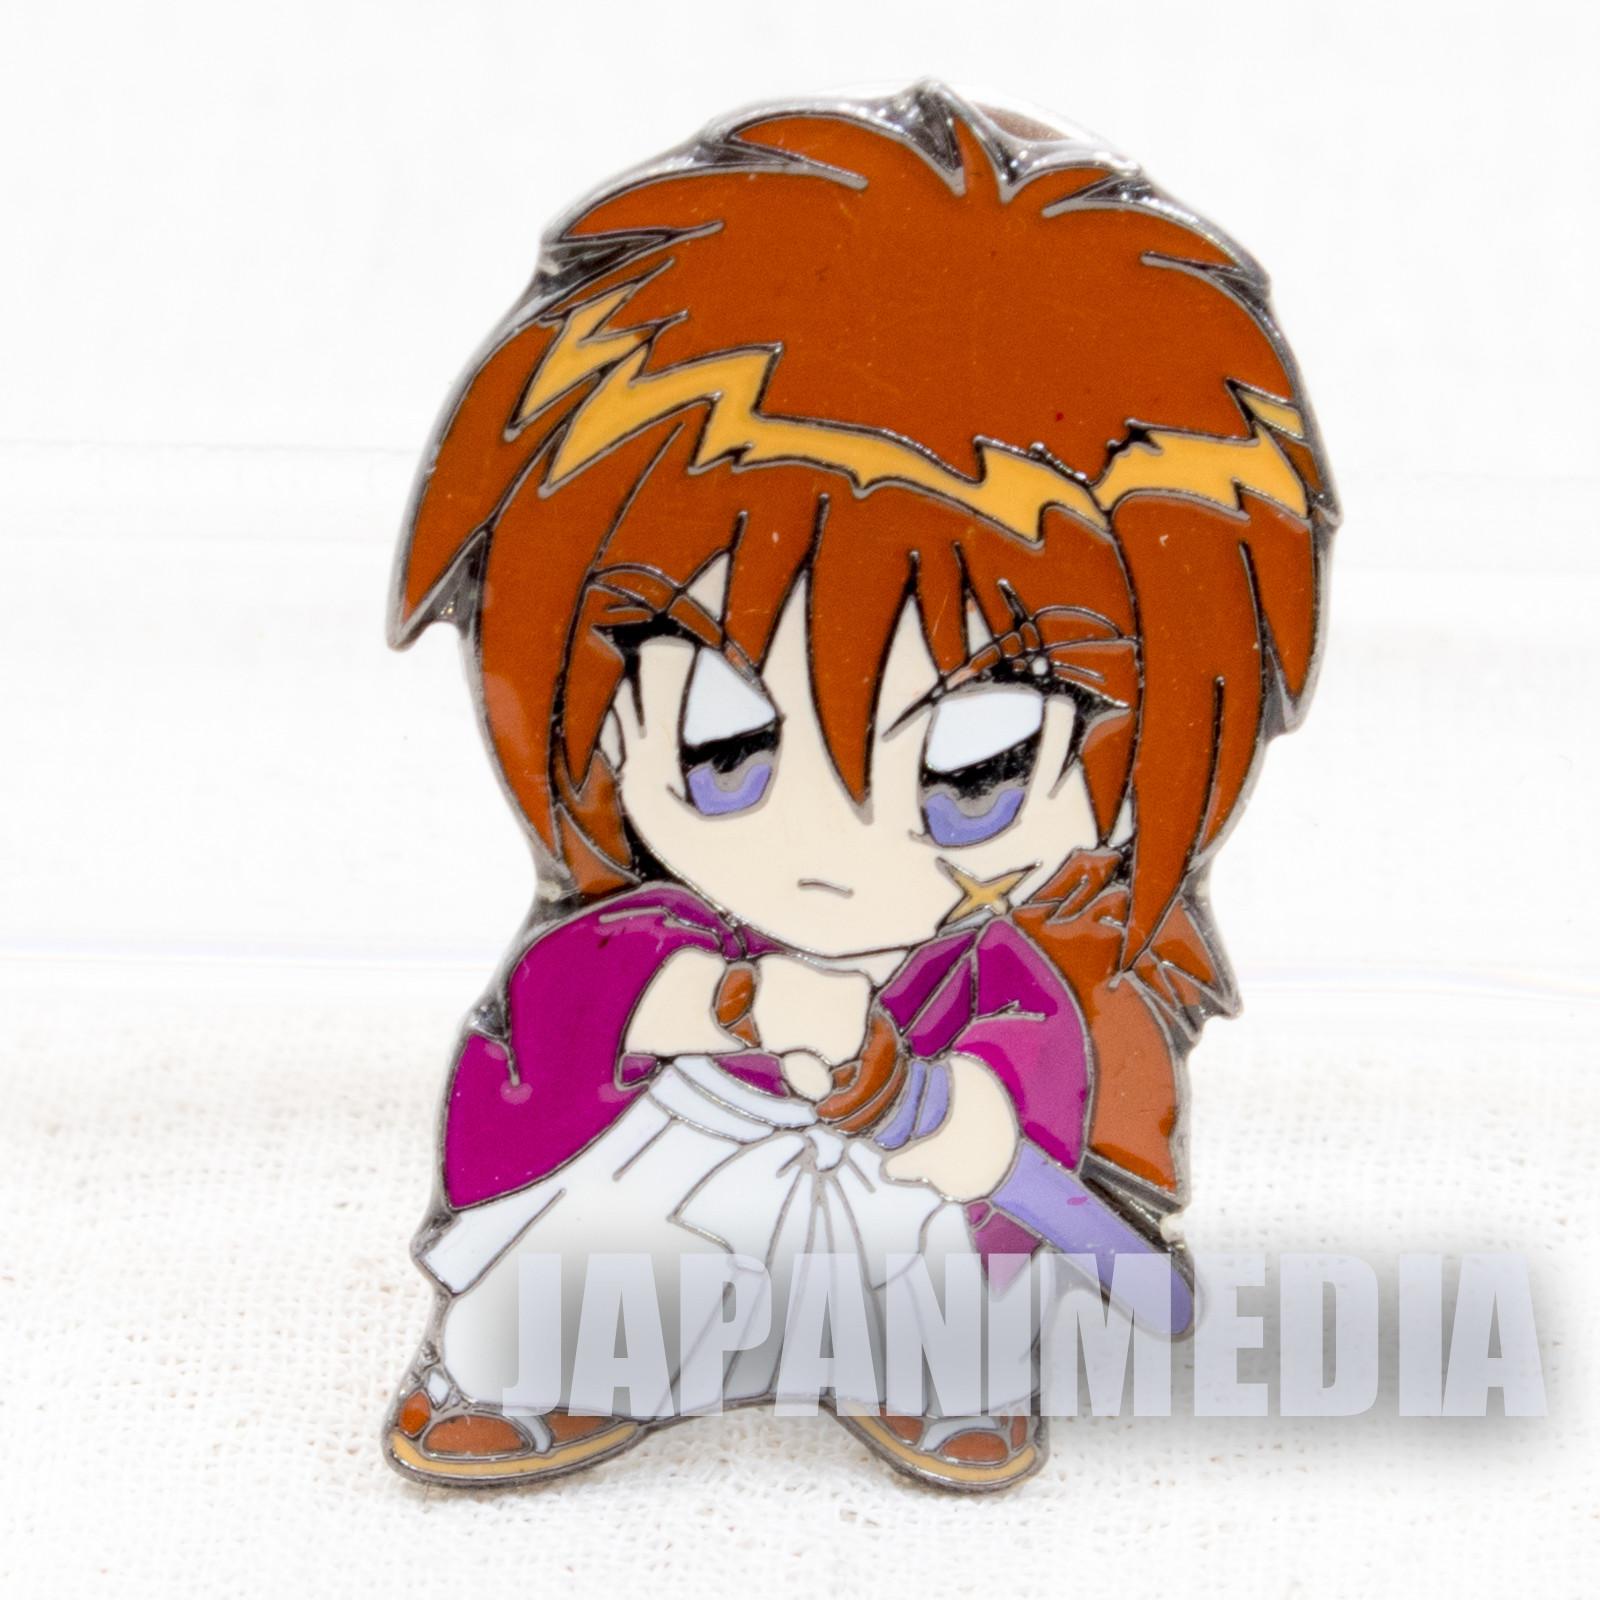 Rurouni Kenshin Kenshin Himura Pins JAPAN ANIME